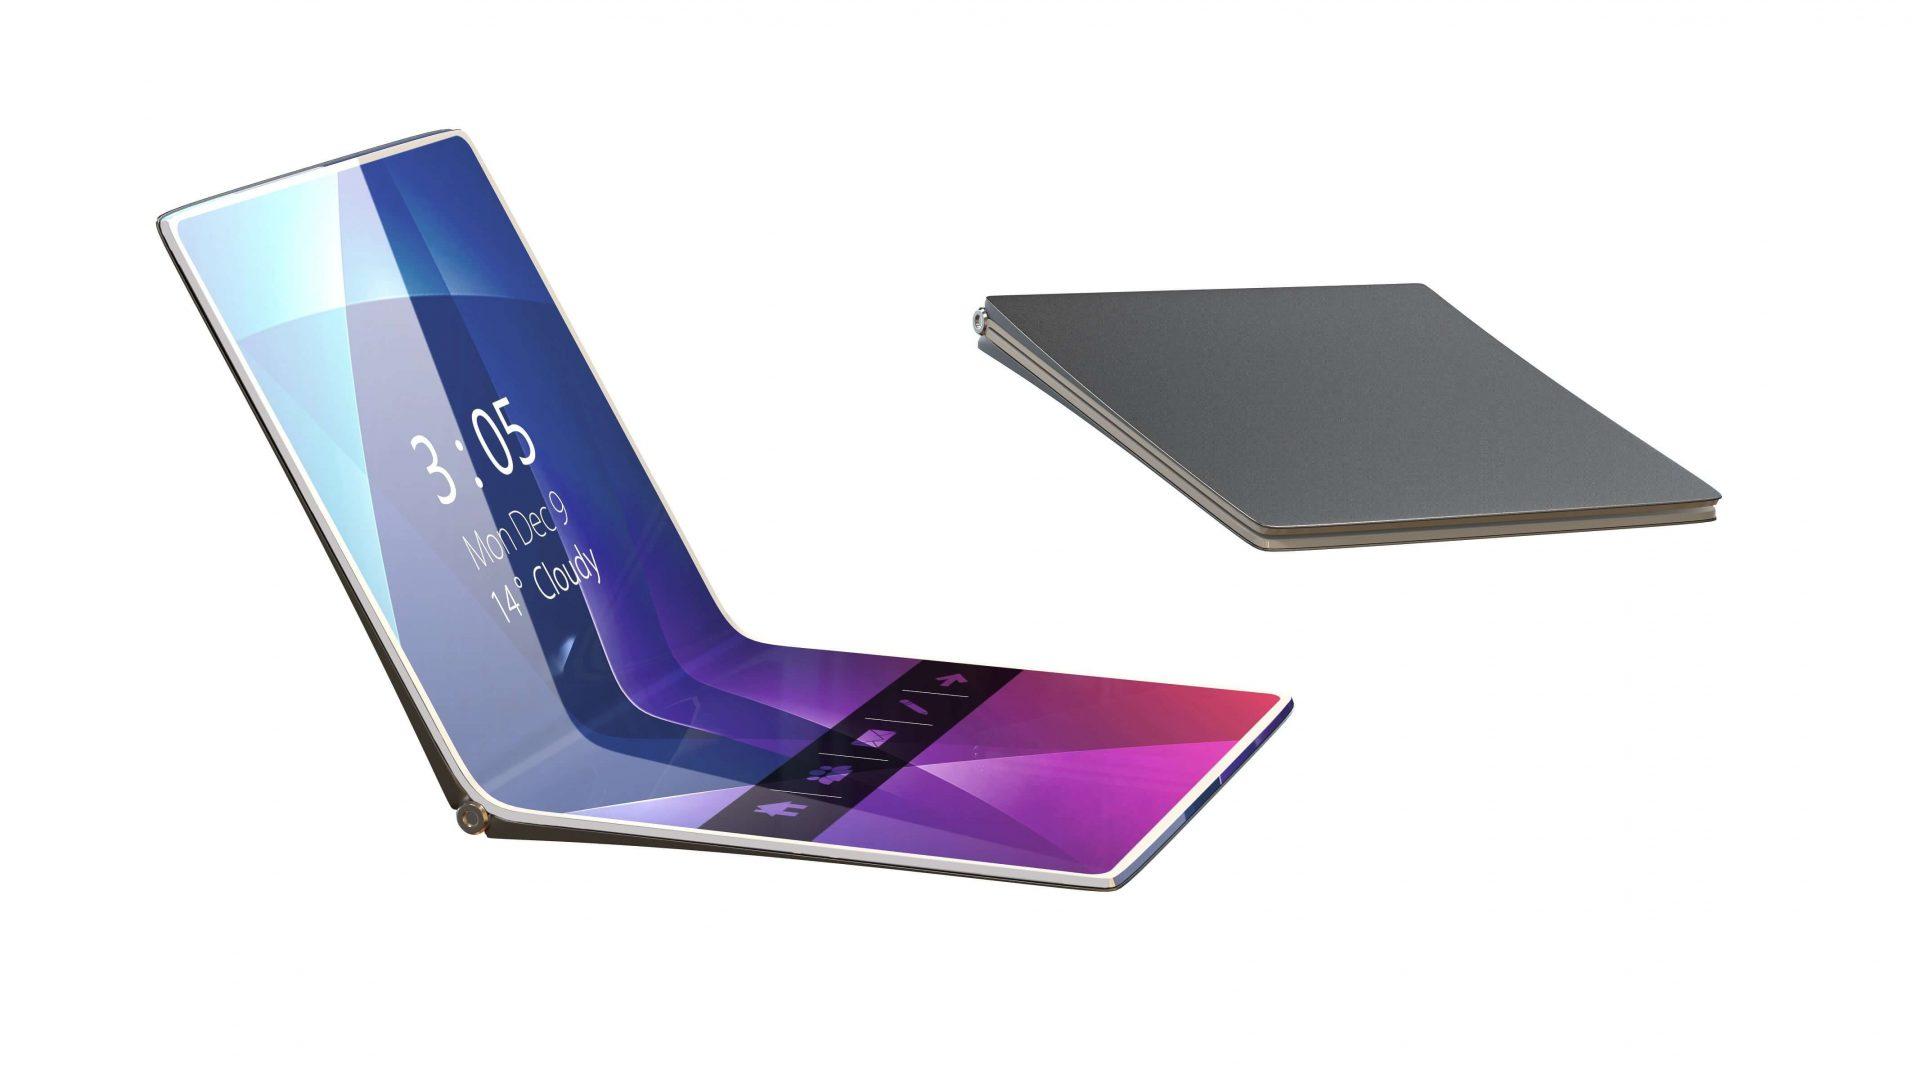 Huawei foldable smartphone